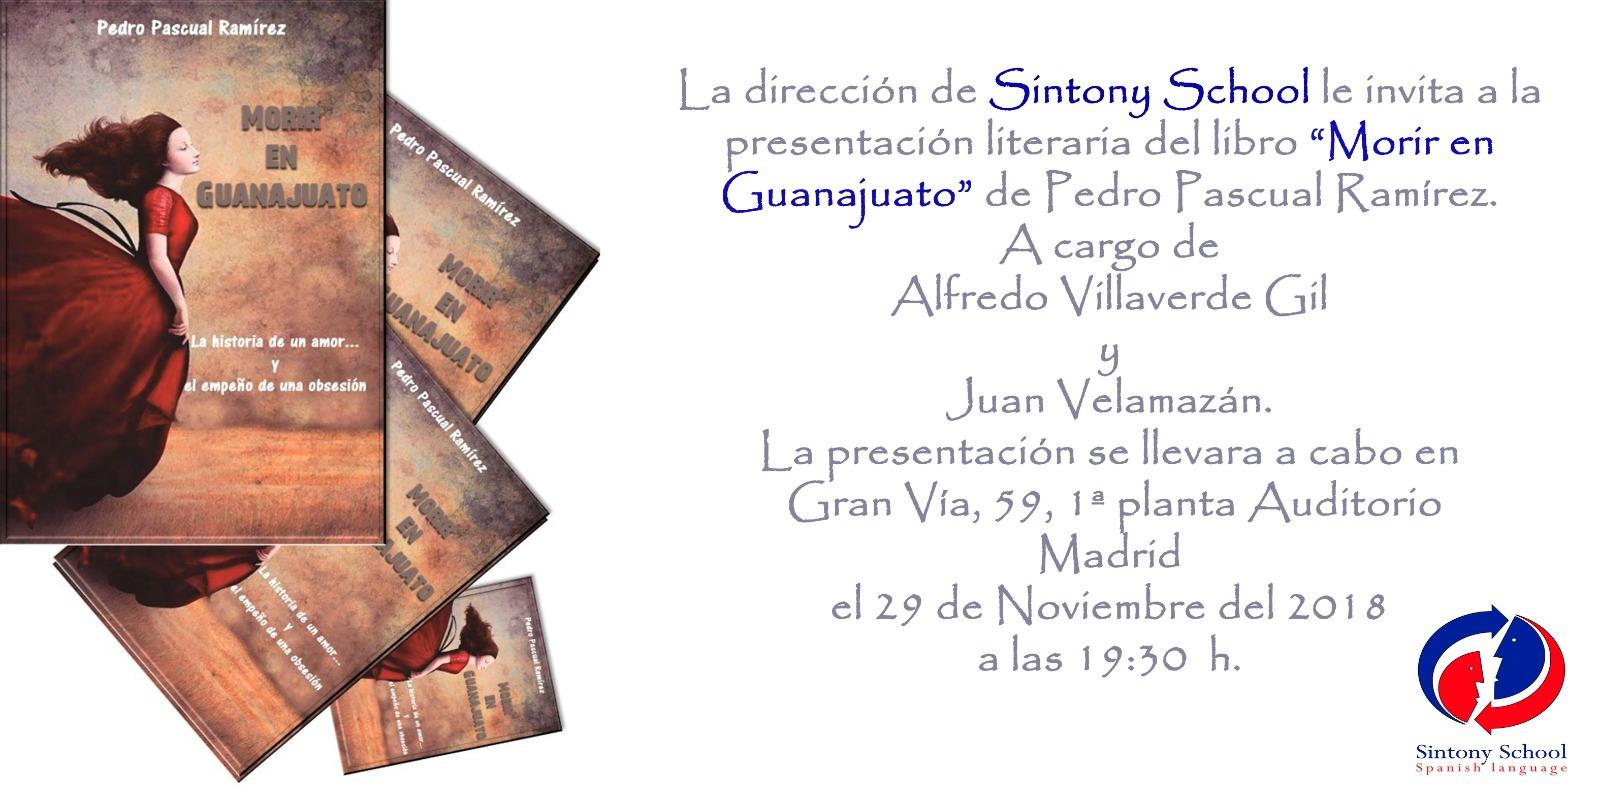 "Presentación del libro ""Morir en Guajanato"" de Pedro Pascual Ramírez a cargo de Alfredo Villaverde y Juan Velamazán"